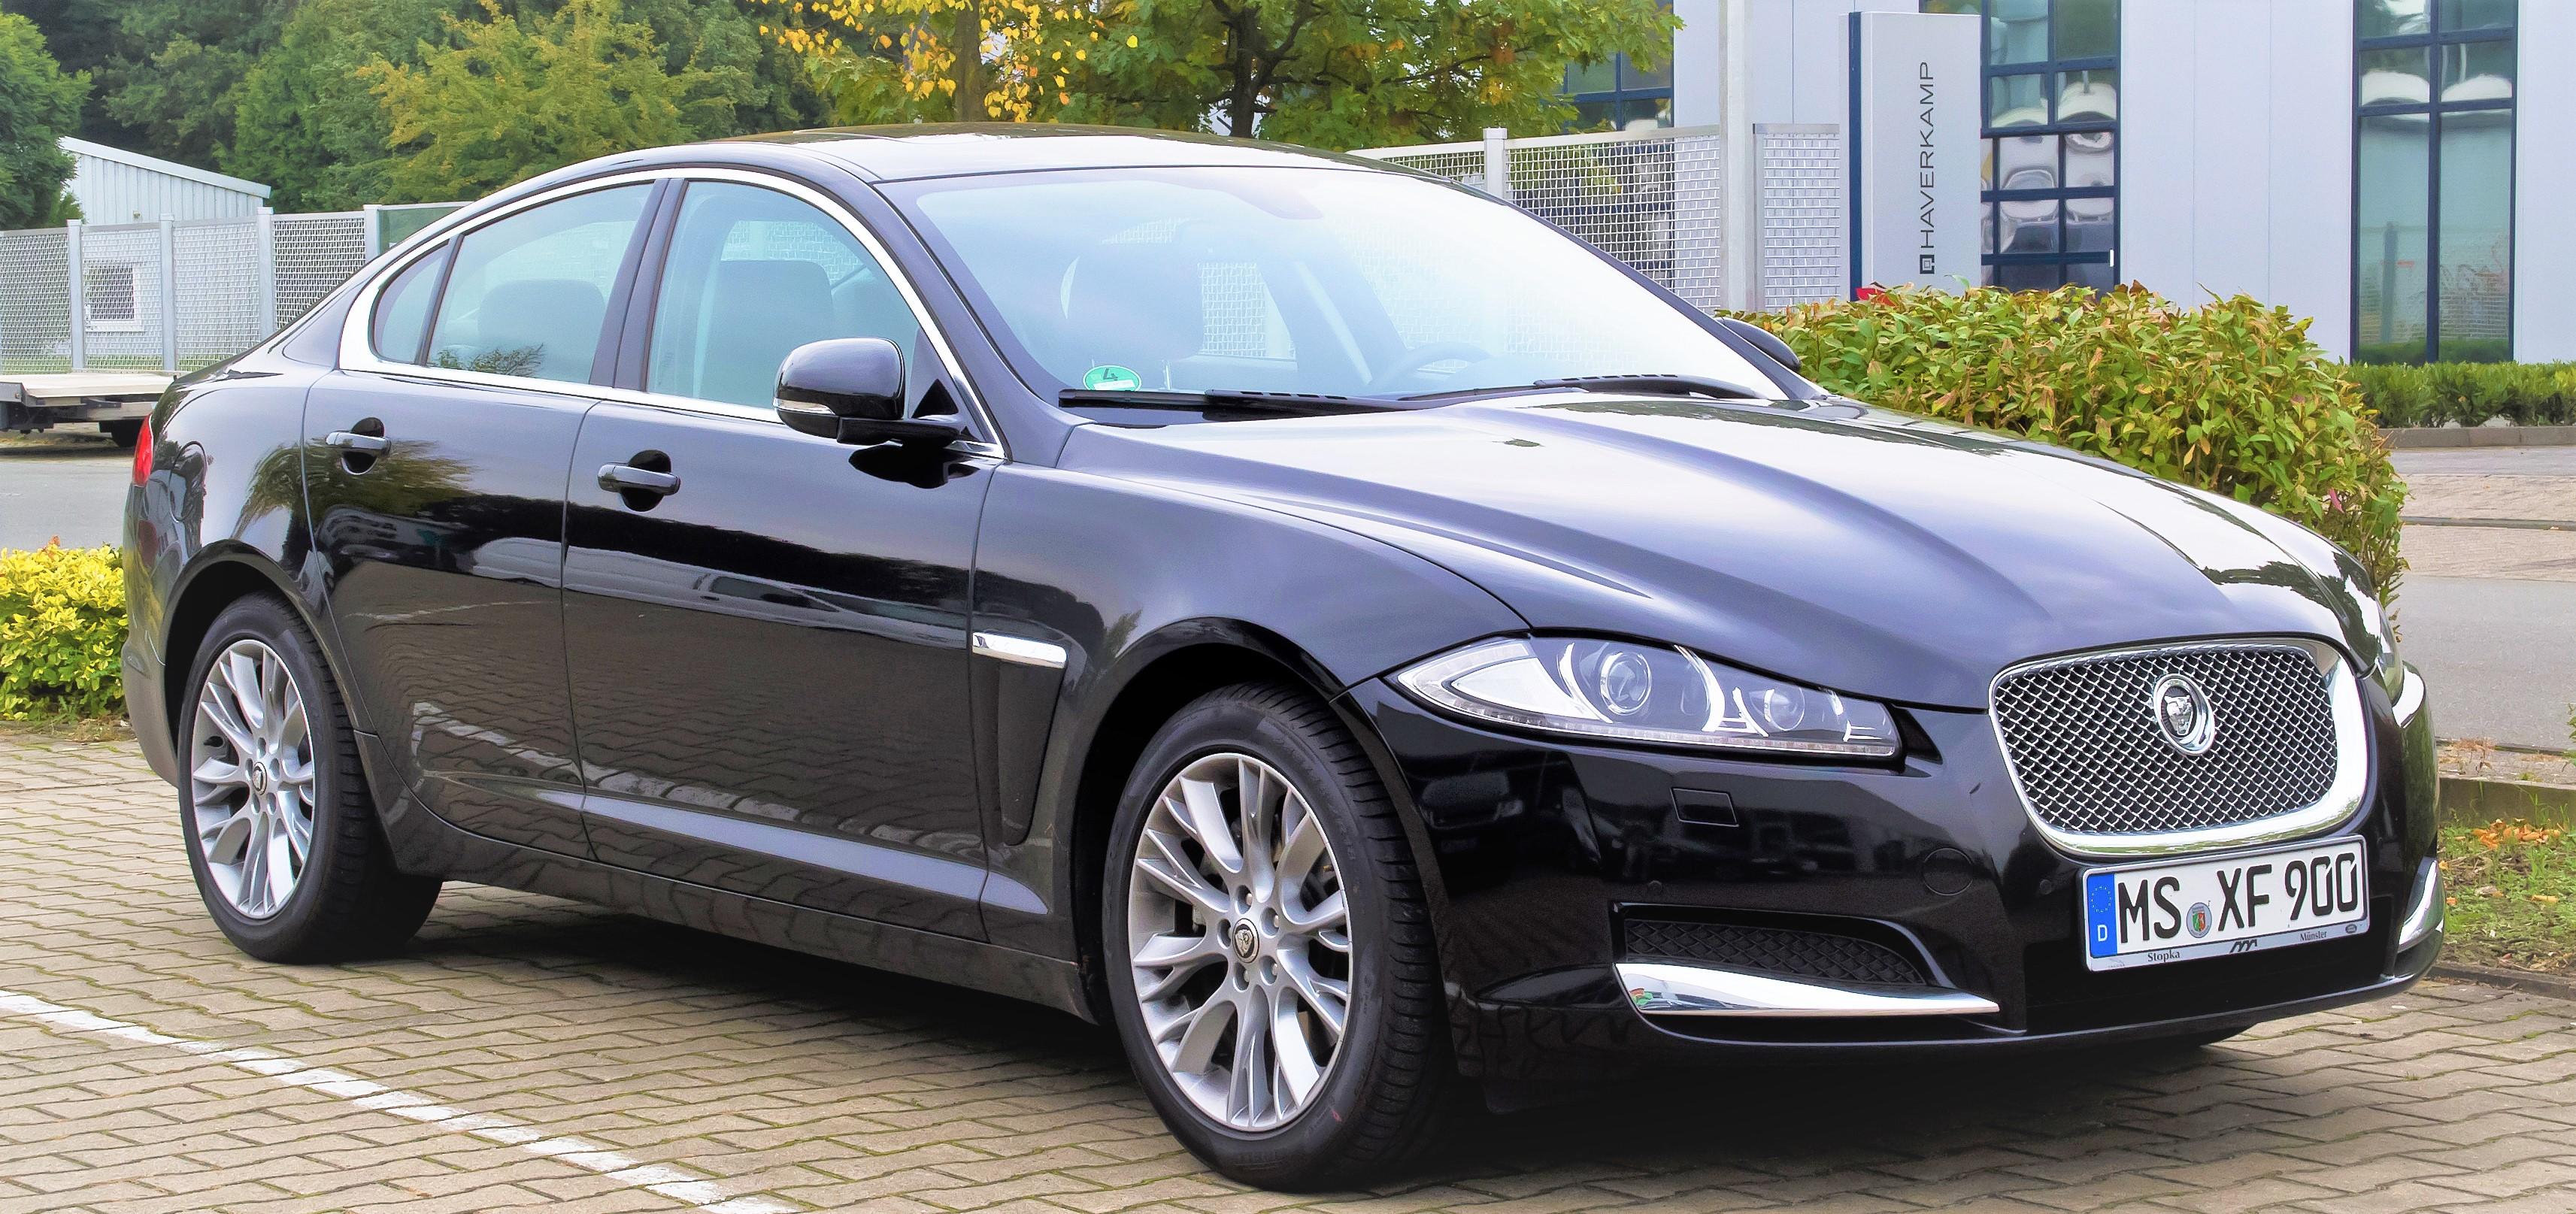 Jaguar_XF_2.2_D_(Facelift)_%E2%80%93_Frontansicht,_5._Oktober_2013,_M%C3%BCnster.jpg